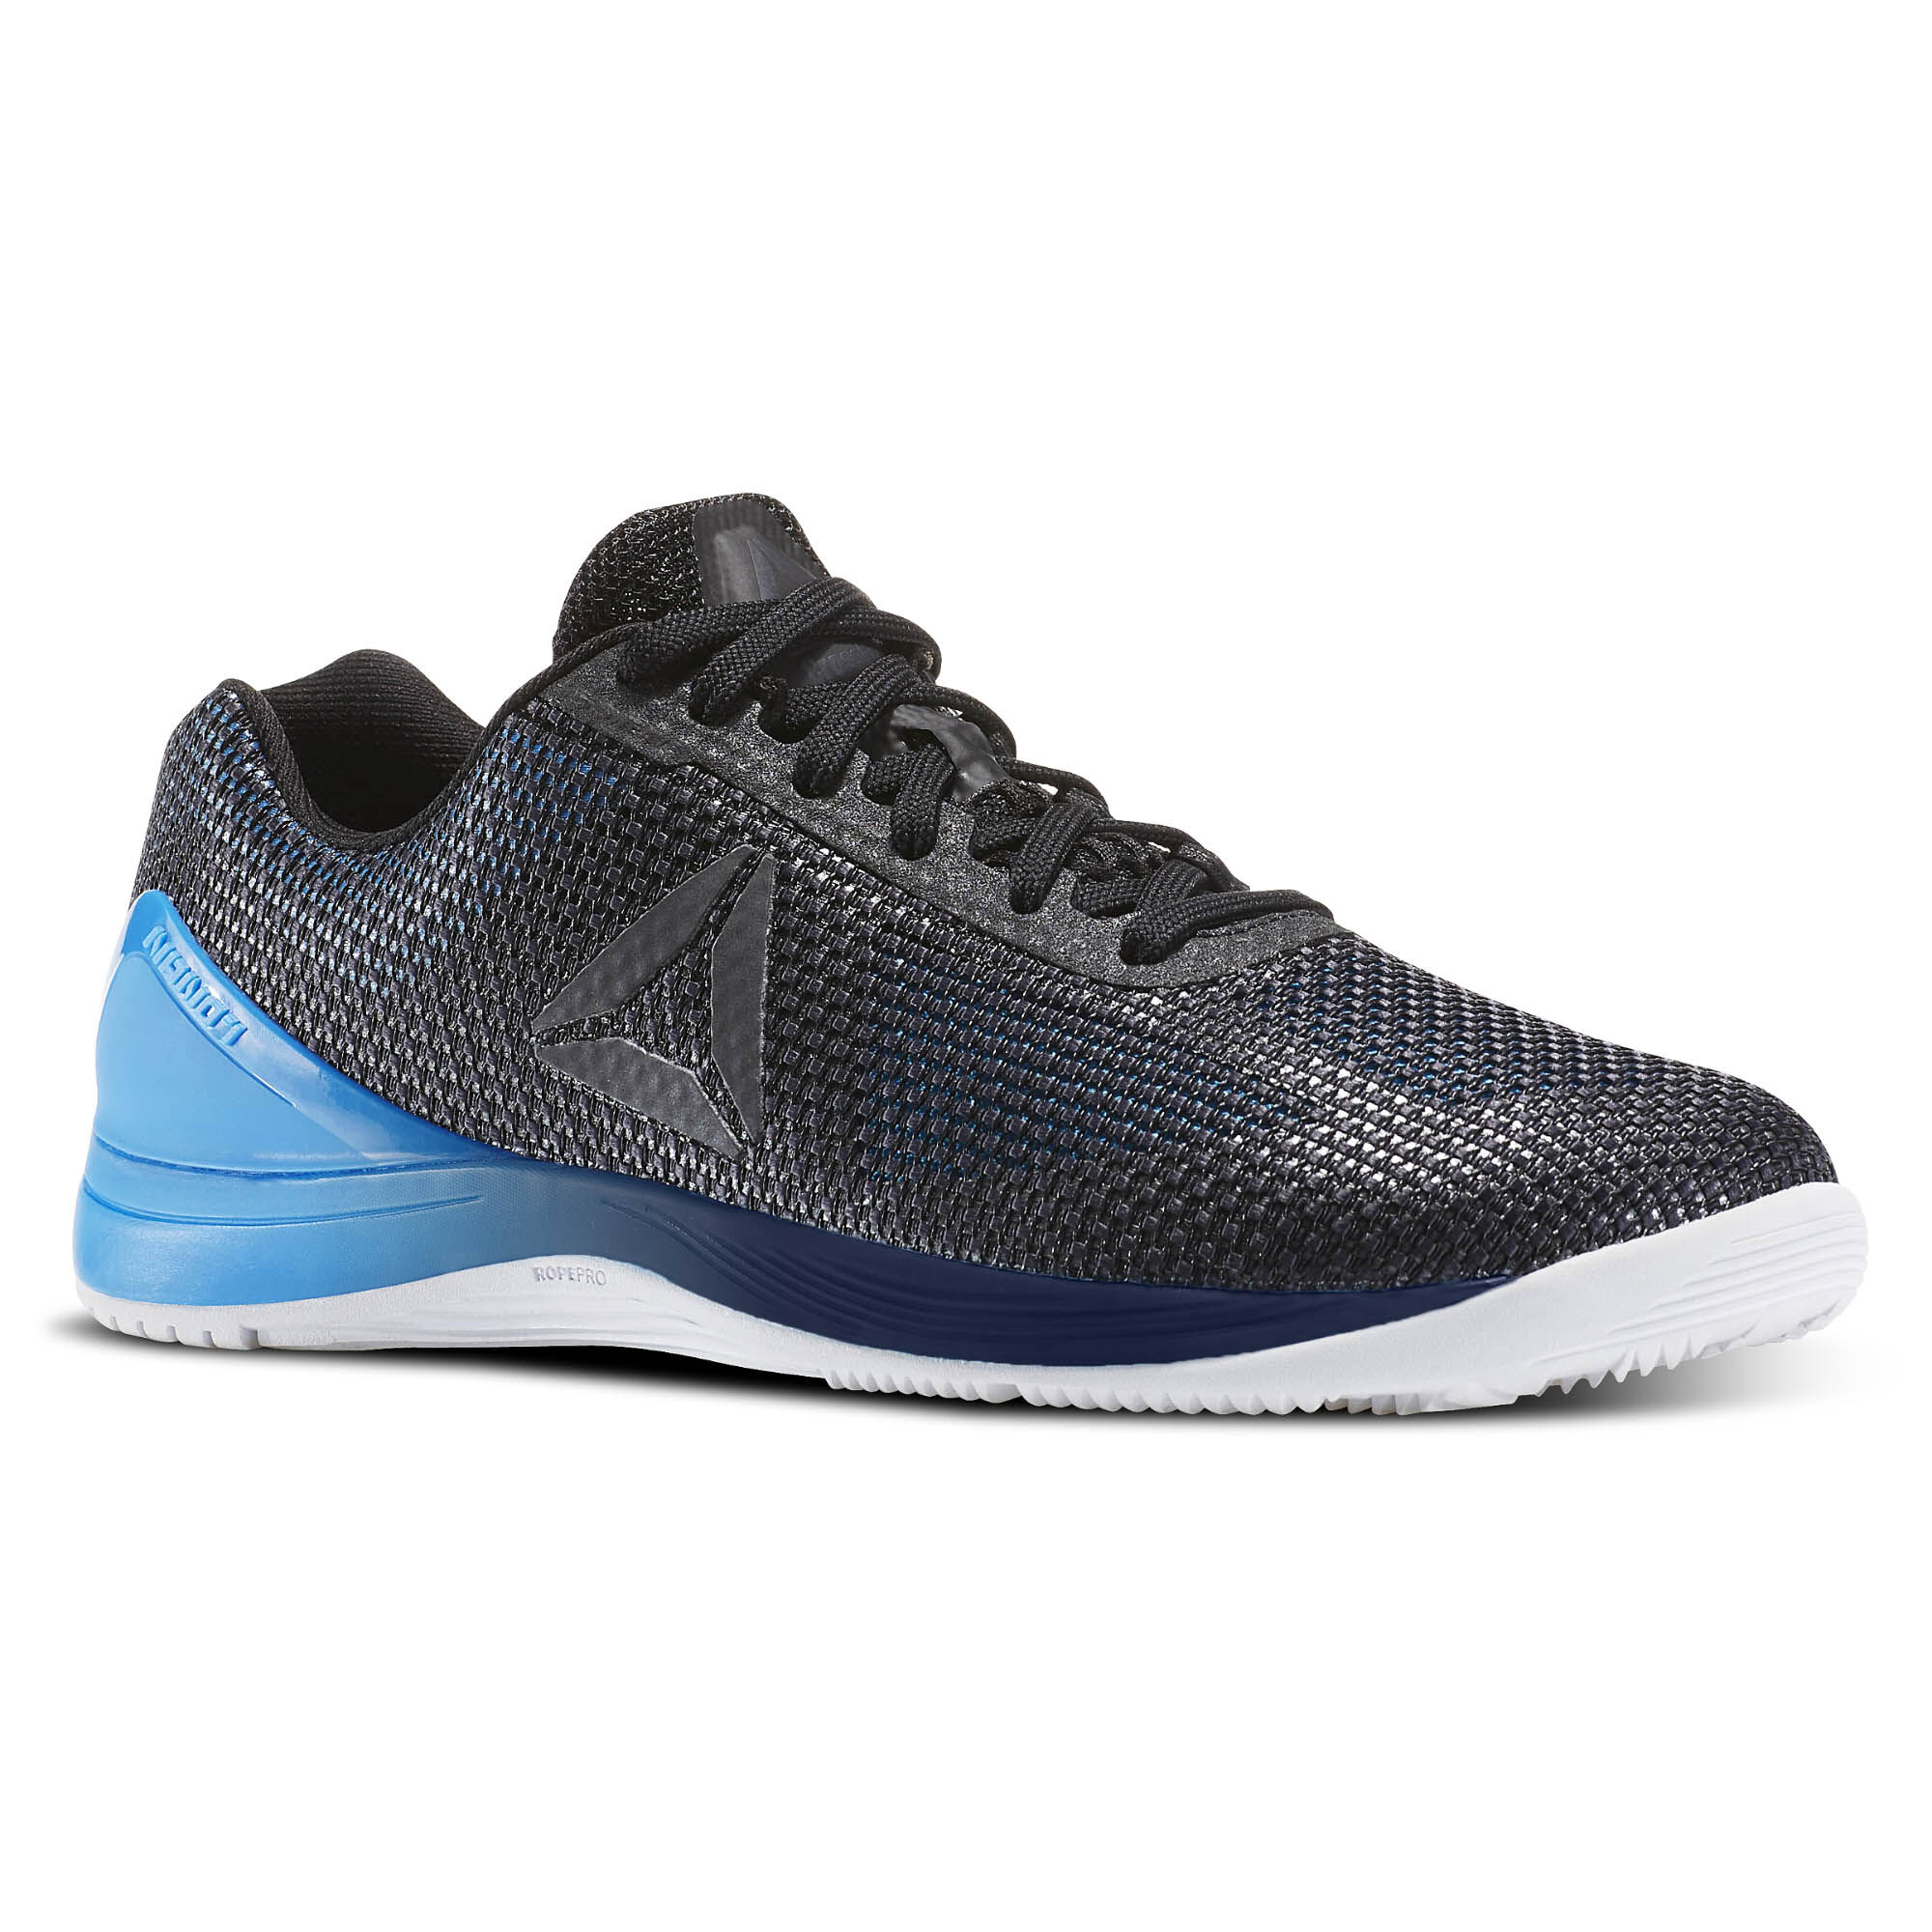 reebok shoes 6 no form in bengali abbreviation